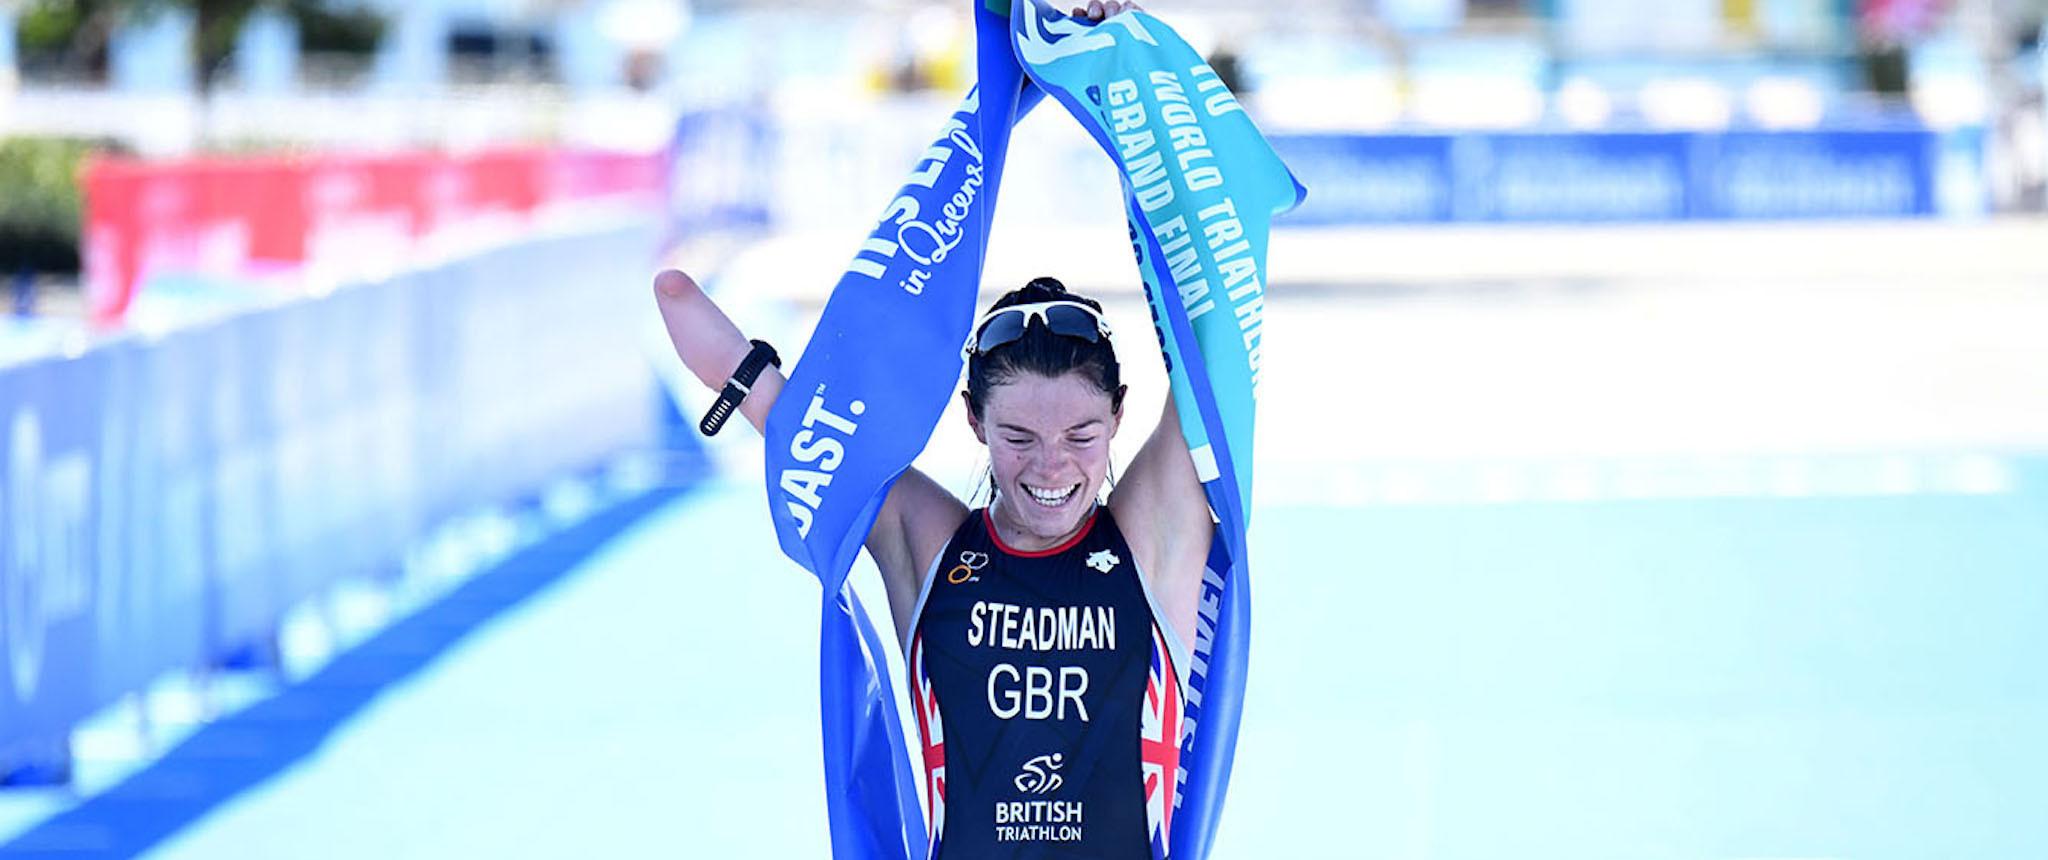 Lauren Steadman has so far won seven World Paratriathlon Championship titles ©British Triathlon